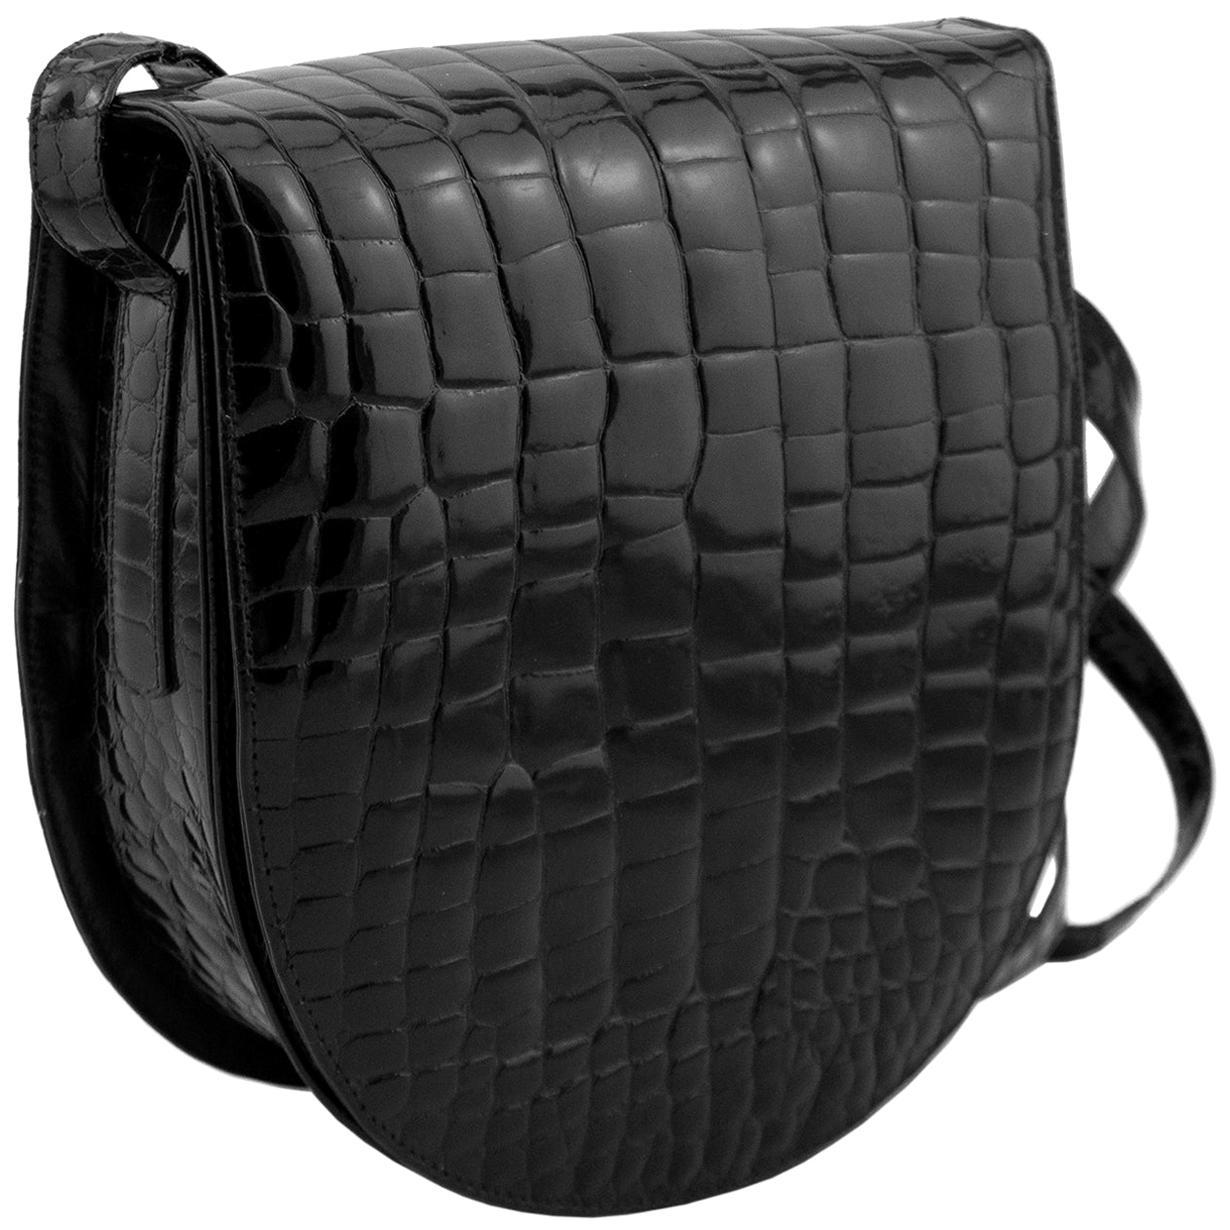 1980s Maude Frizon Black Stamped Leather Crossbody Bag